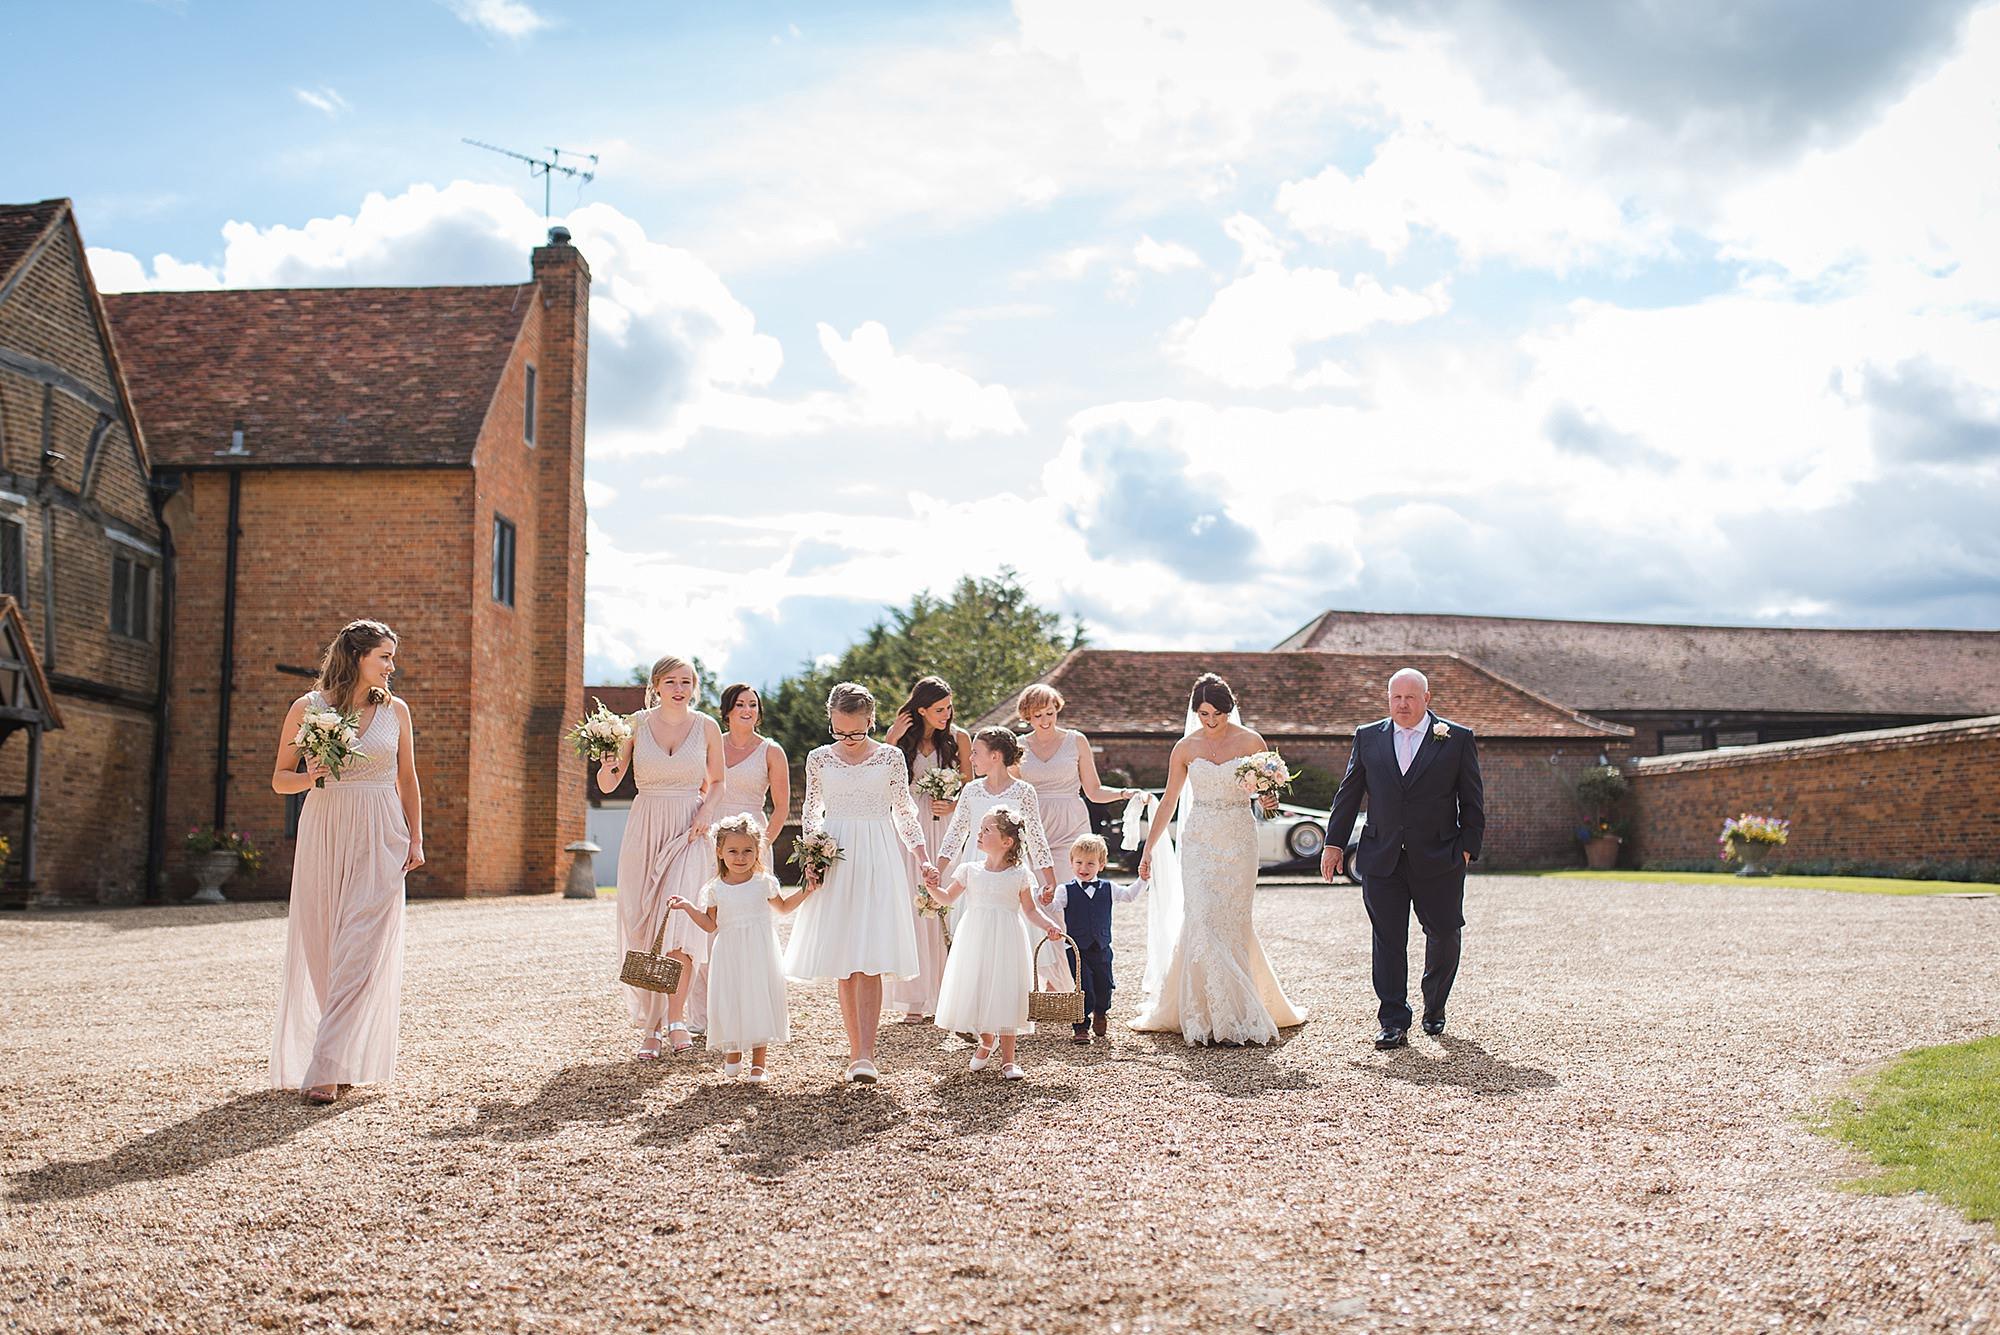 Lillibrooke Manor wedding bridal party walks to ceremony